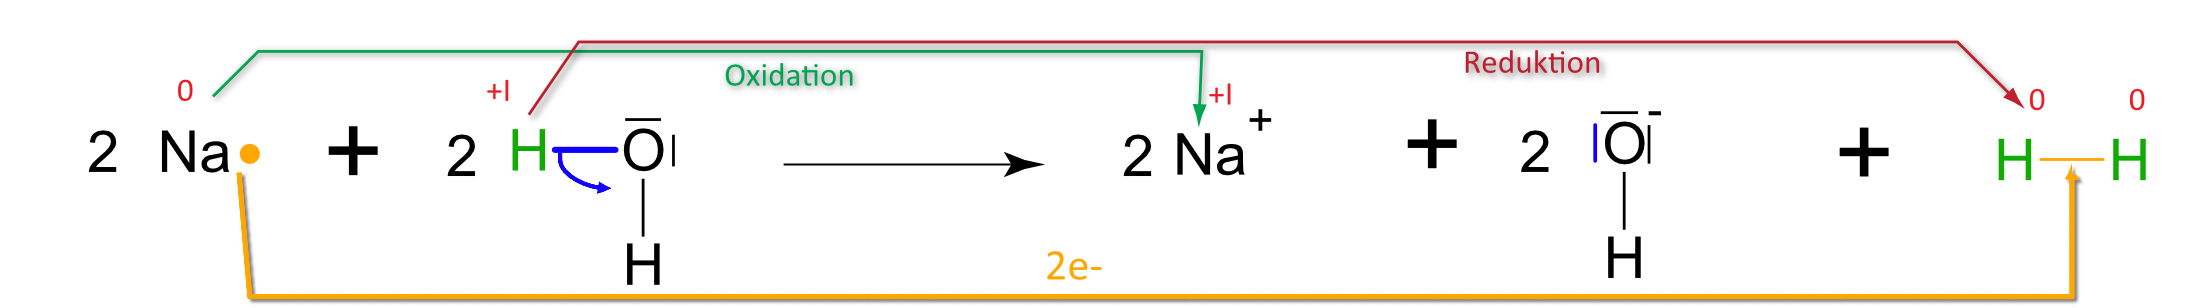 5 1 4 versuch ethanol reagiert mit alkalimetall. Black Bedroom Furniture Sets. Home Design Ideas